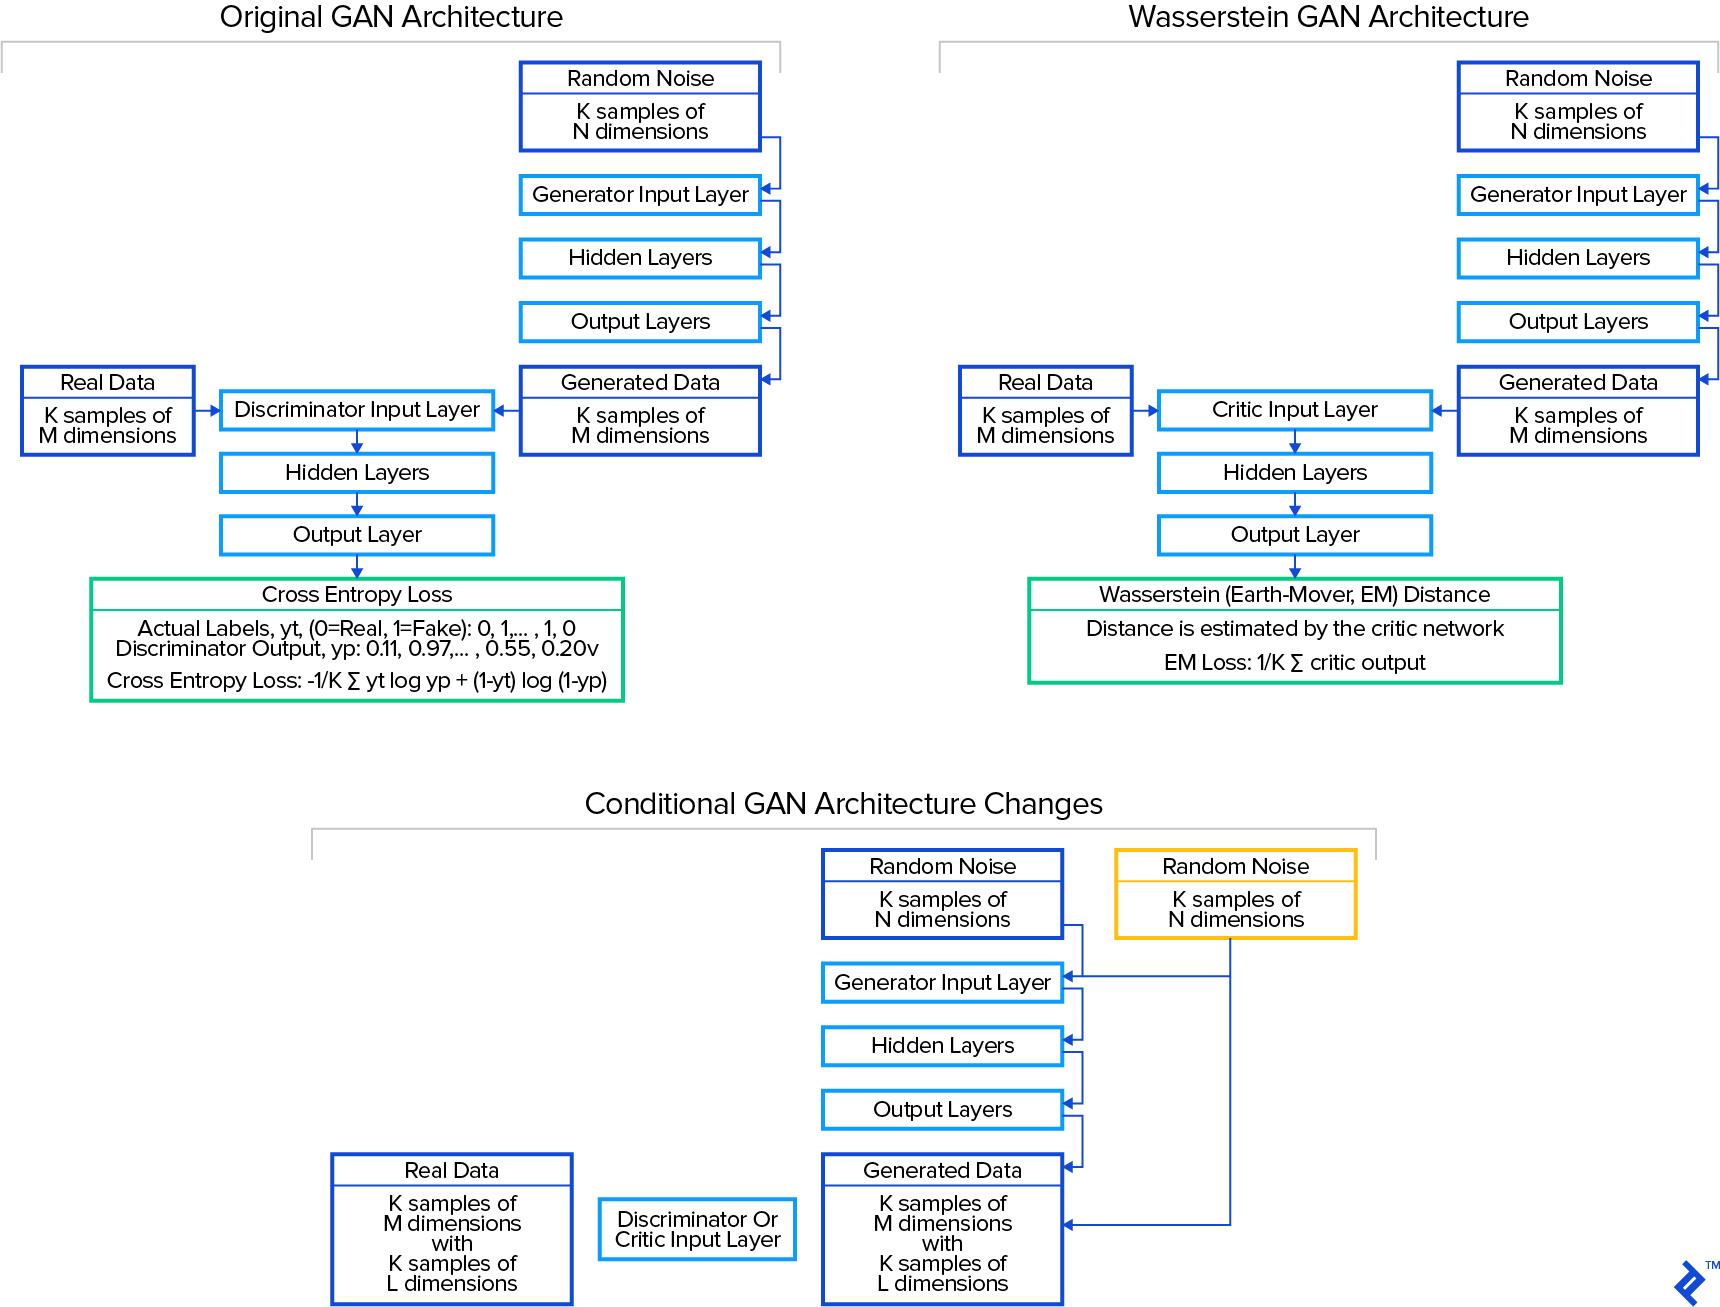 GAN architectures